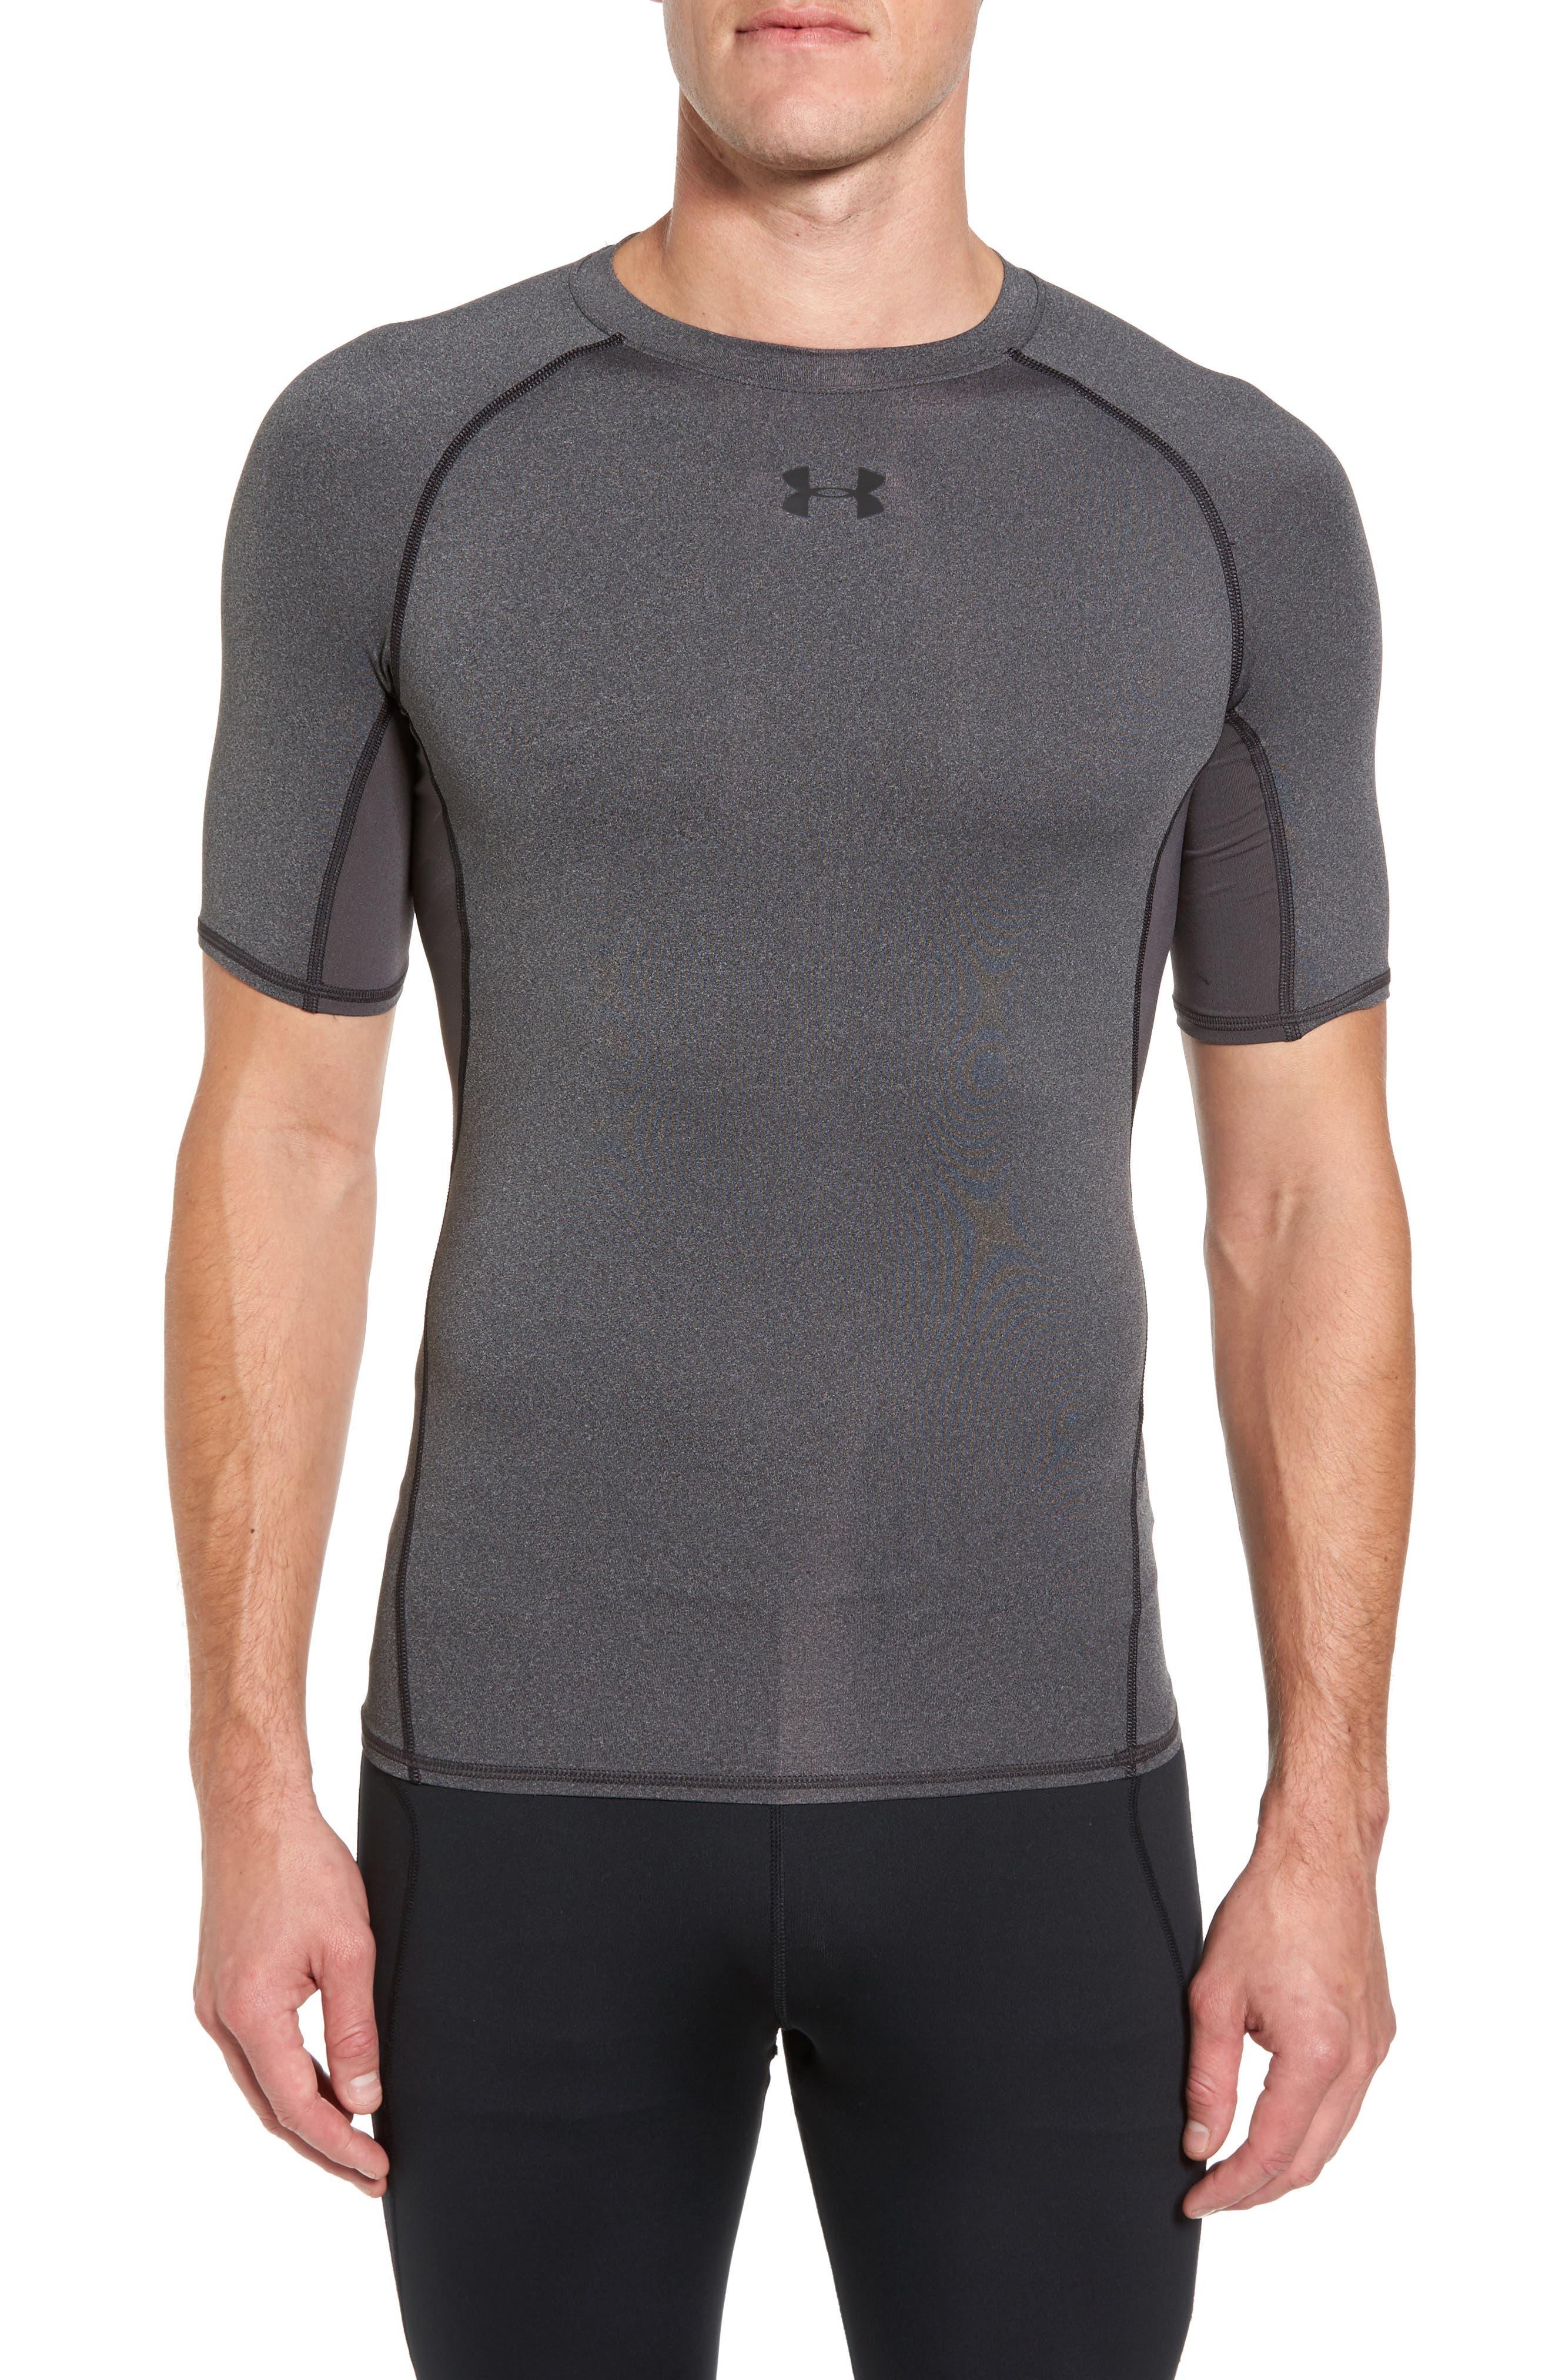 Under Armour Heatgear Compression Fit T-Shirt, Grey